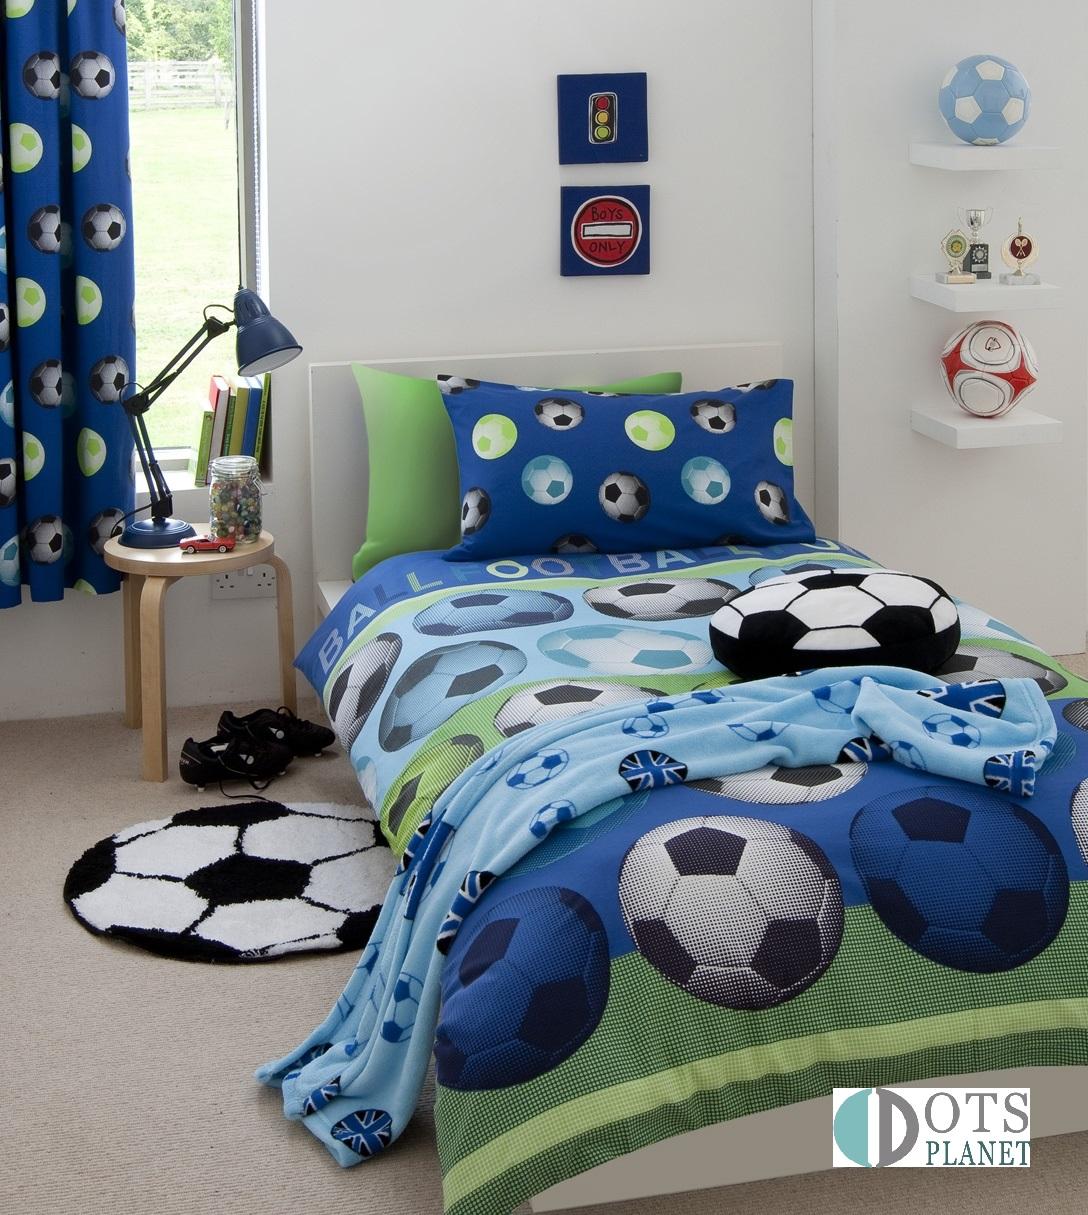 Childrens Football Bedroom Ideas: Pościel Niebieska Piłka FOOTBALL 140x200